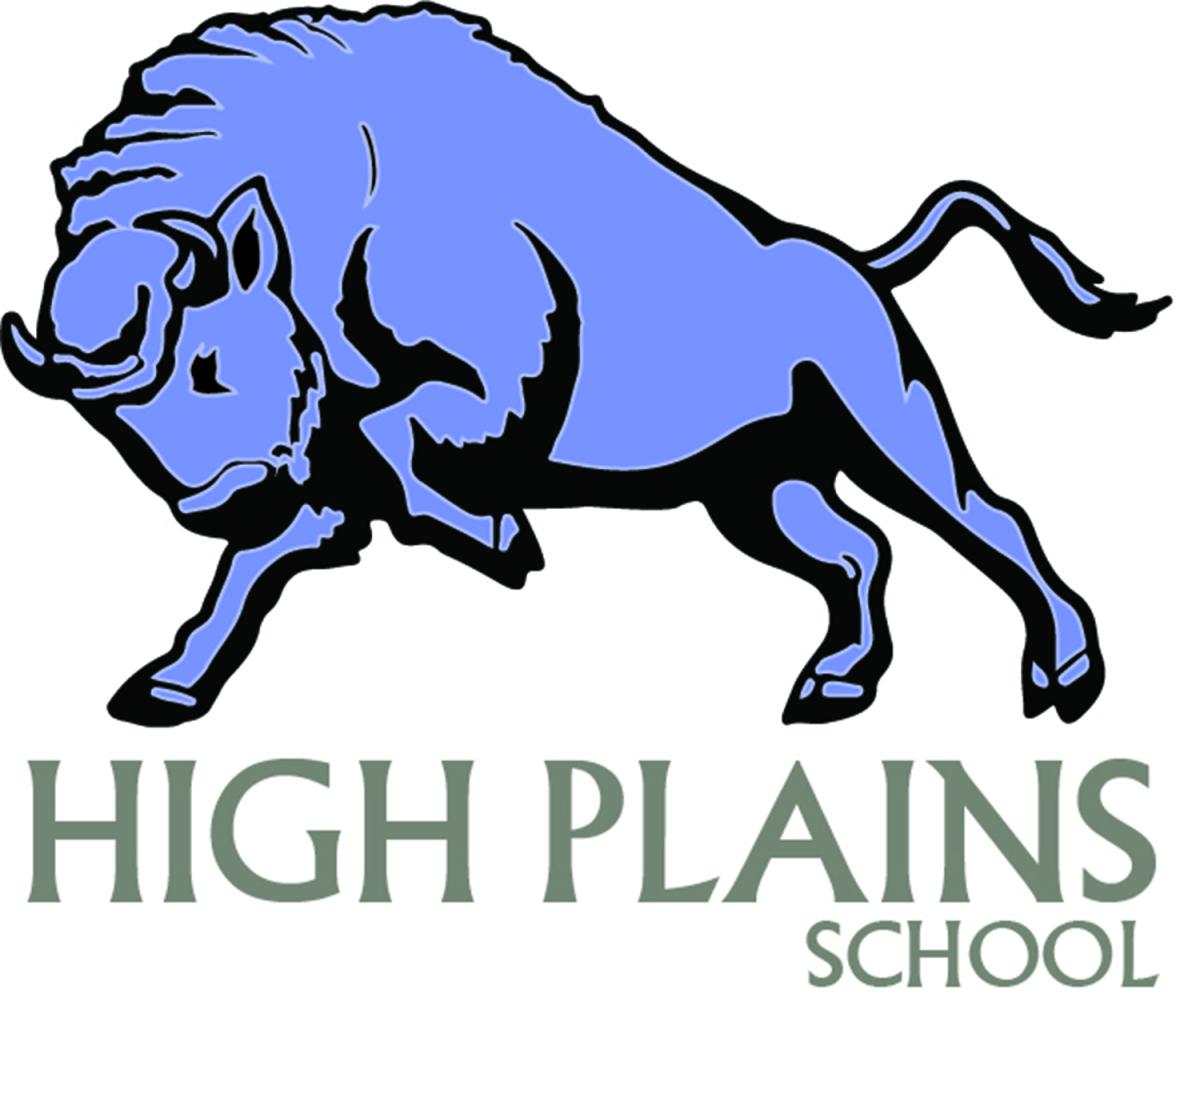 Winner Announced in High Plains School Logo Contest.